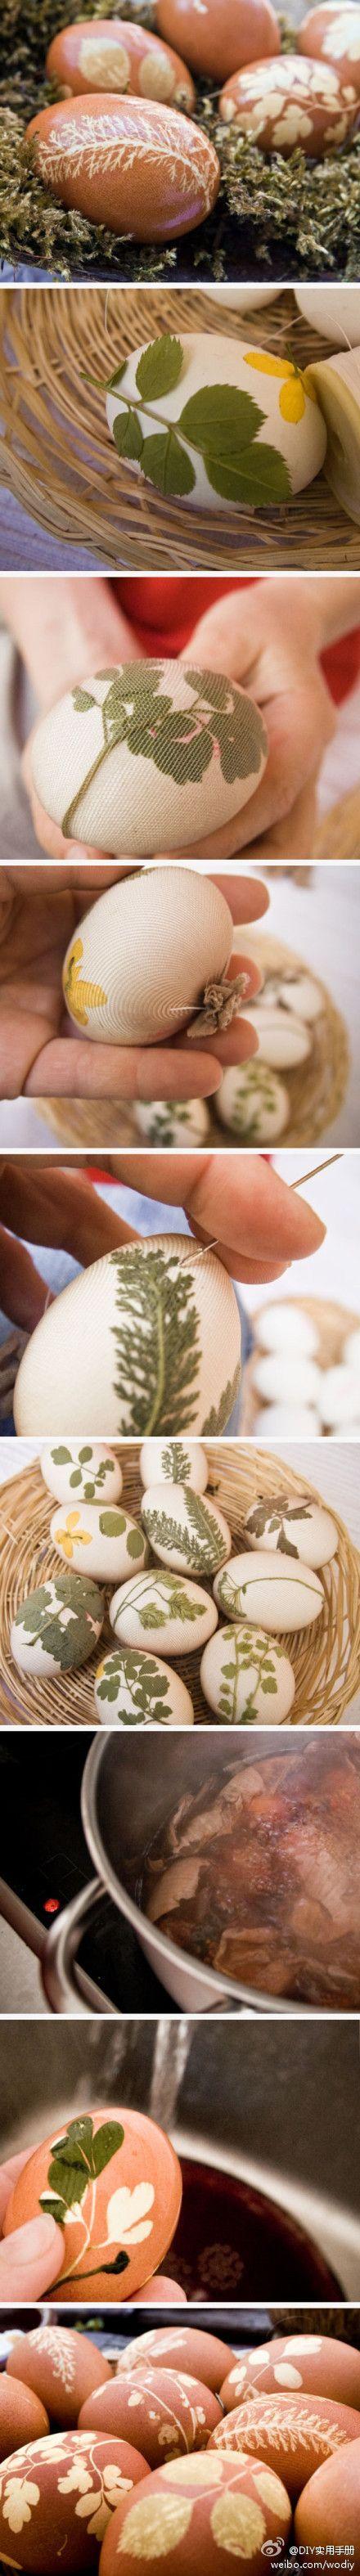 Velikonoce - eggs!